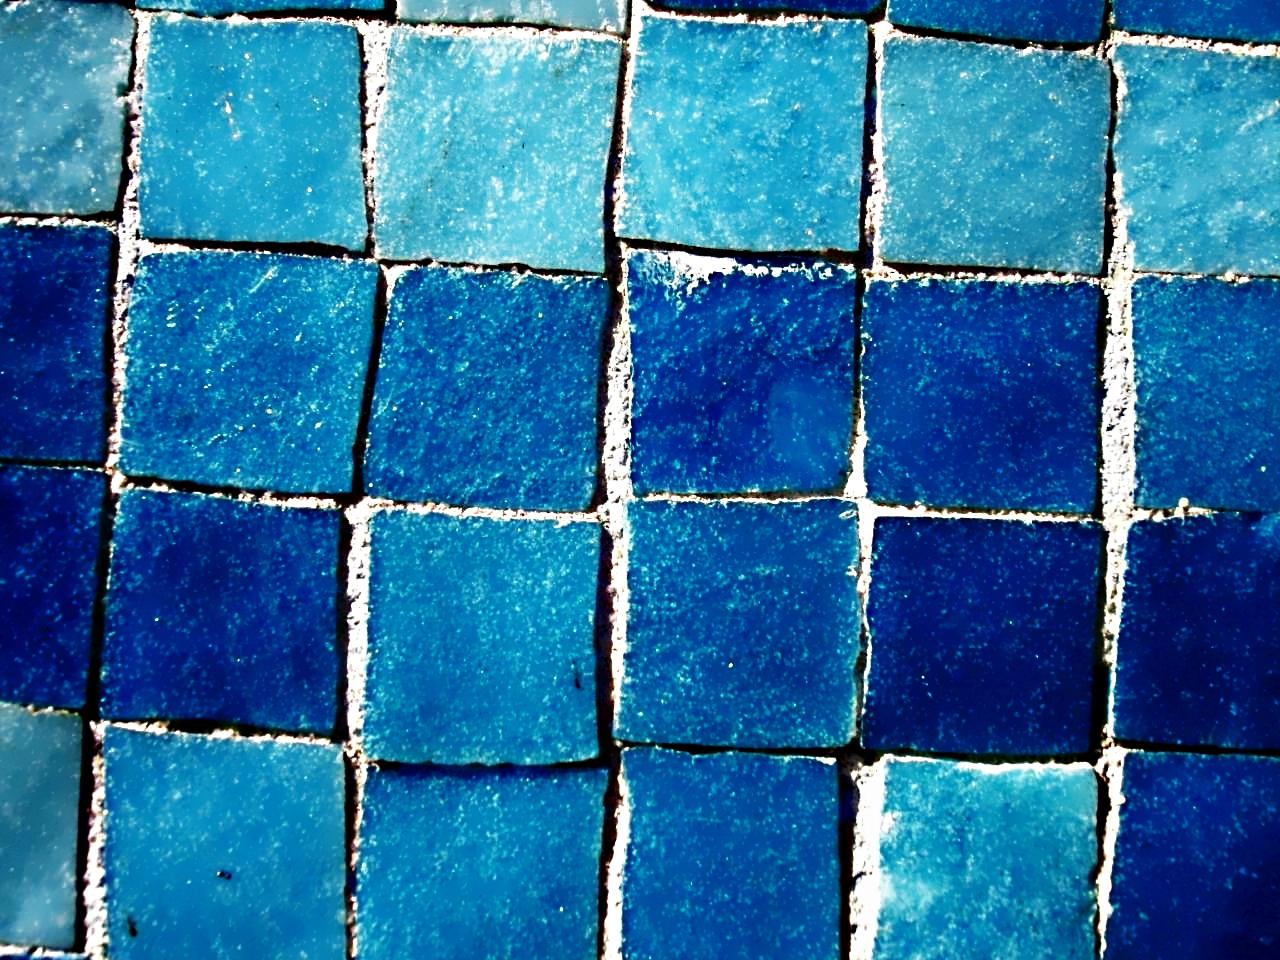 Blue Tiles Flickr Photo Sharing